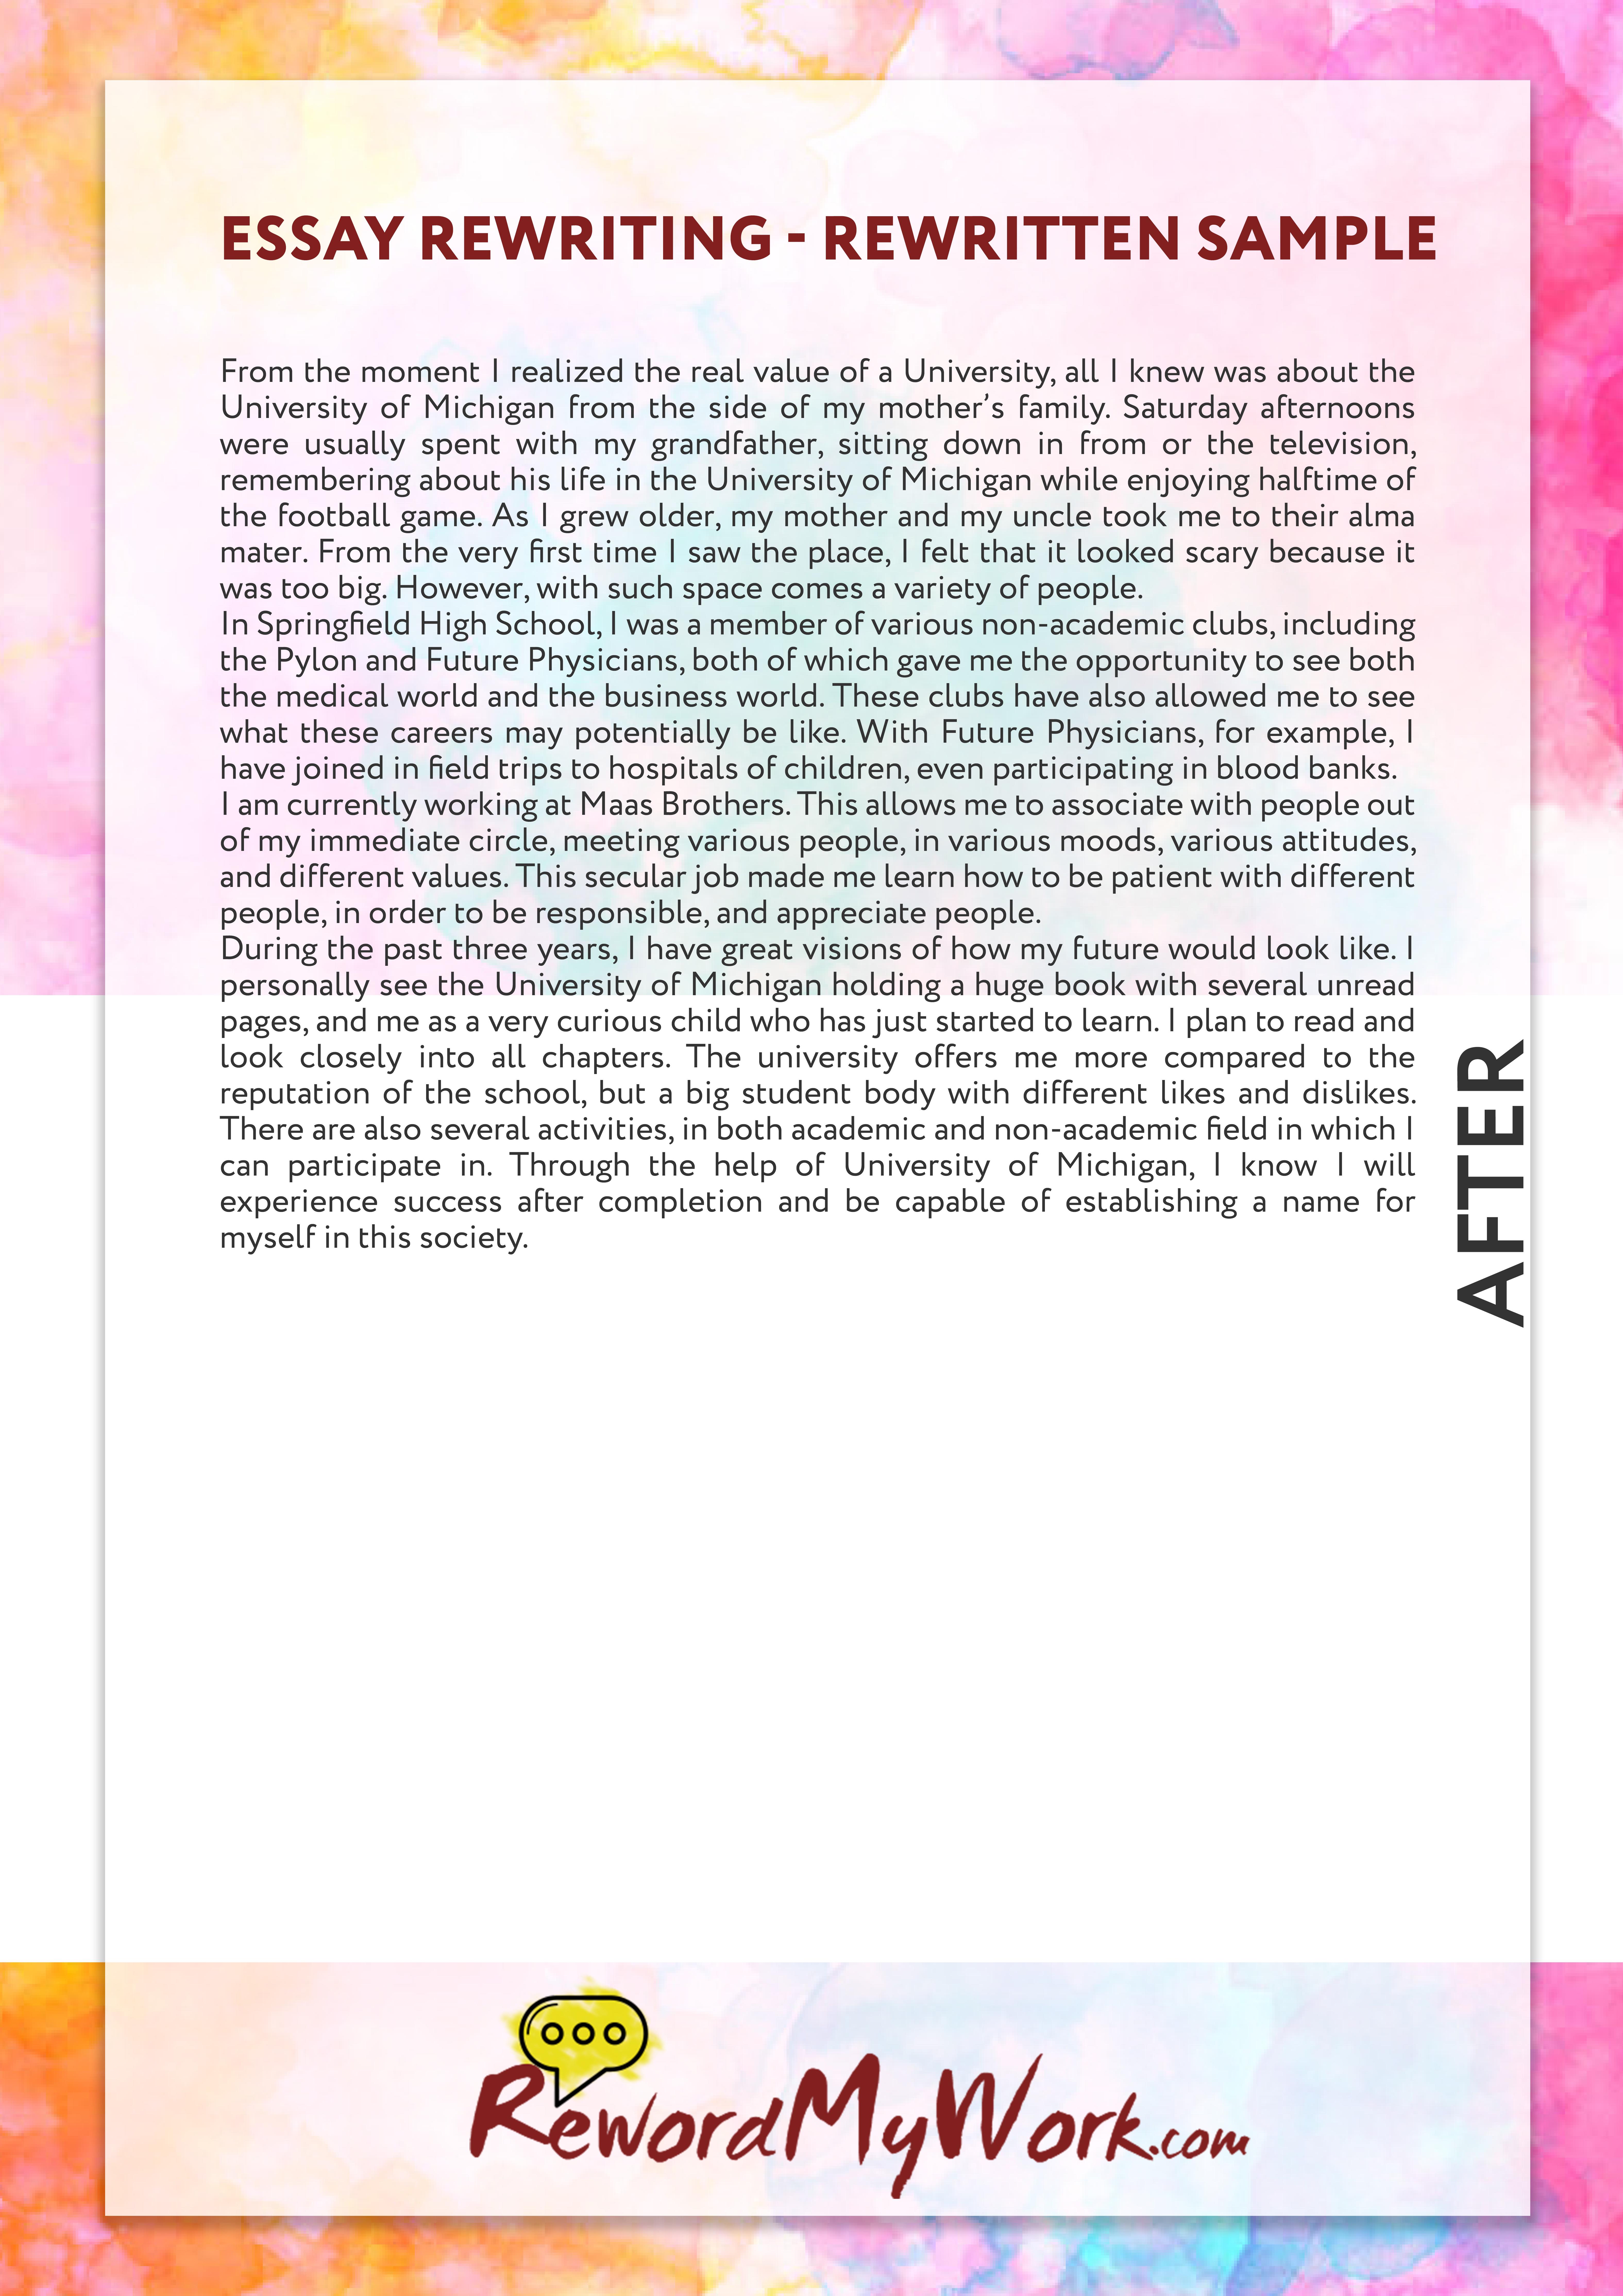 003 Reword Essay Example Amazing Generator Free Full